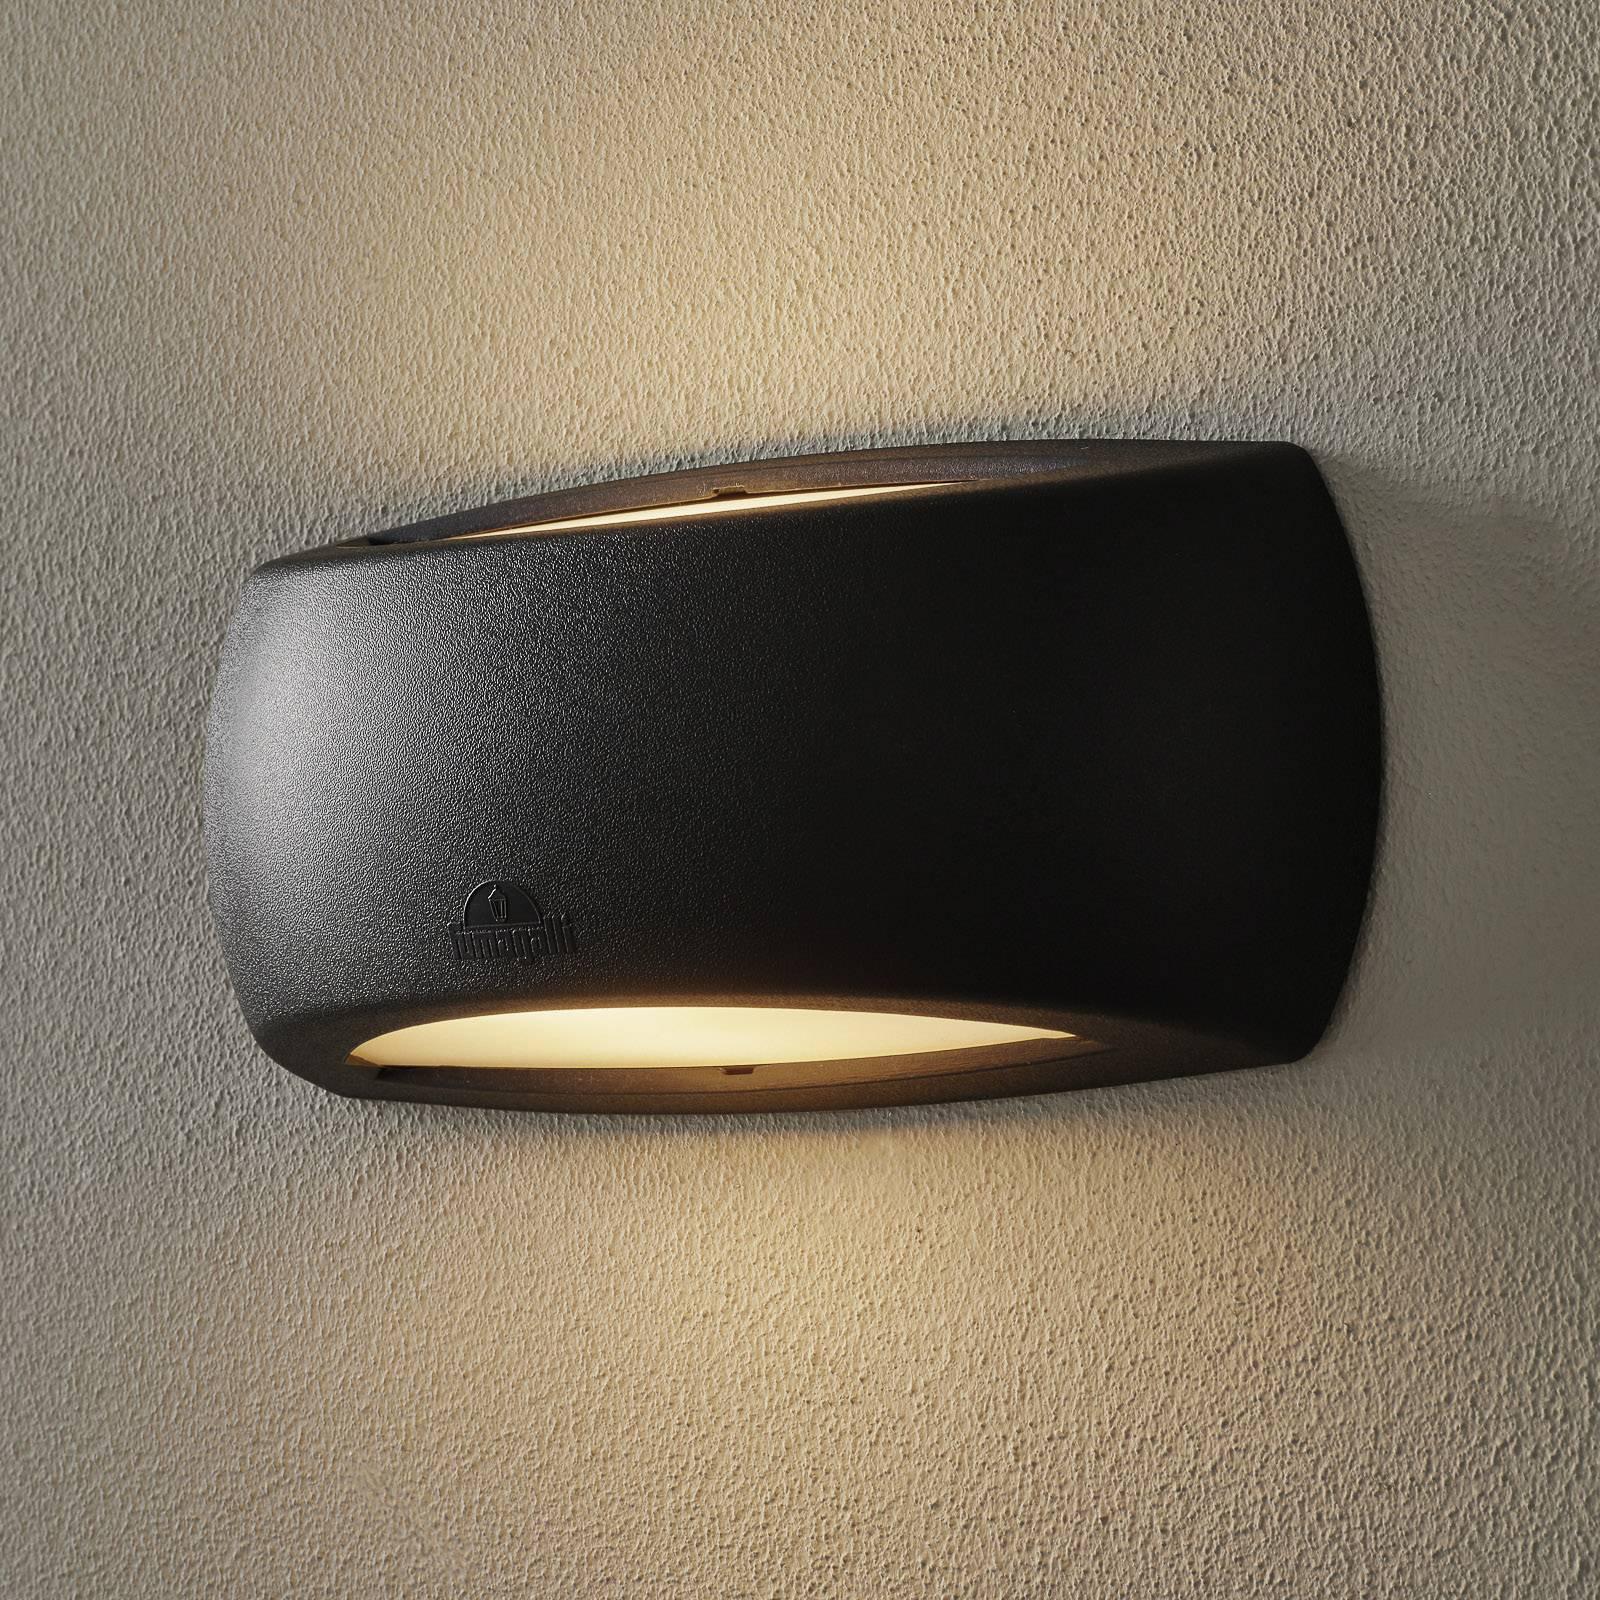 LED-vegglampe Francy Up/Down 6W 2 700 K svart